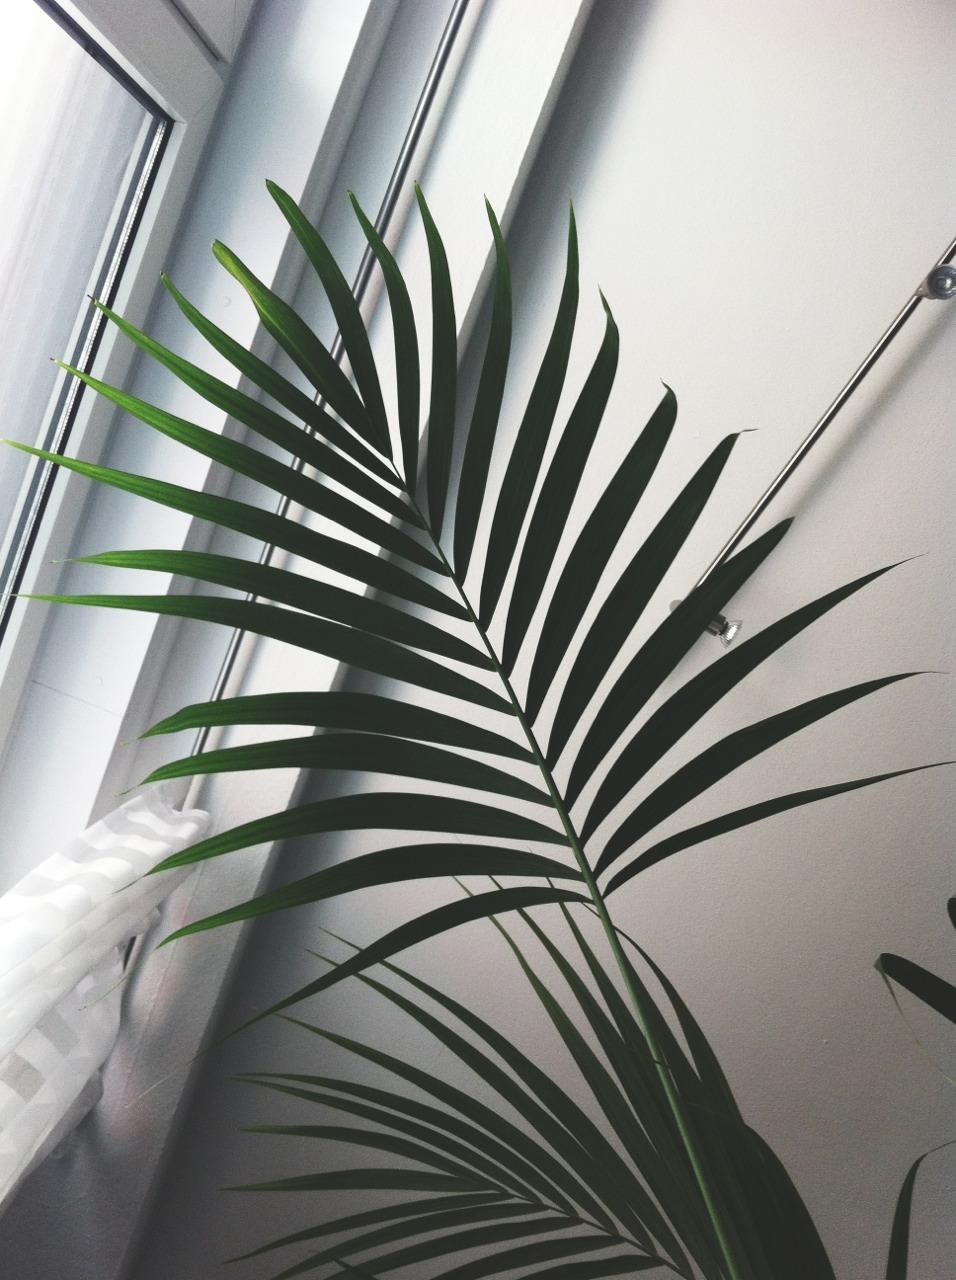 Ferns in good light next to window ITCHBAN.com